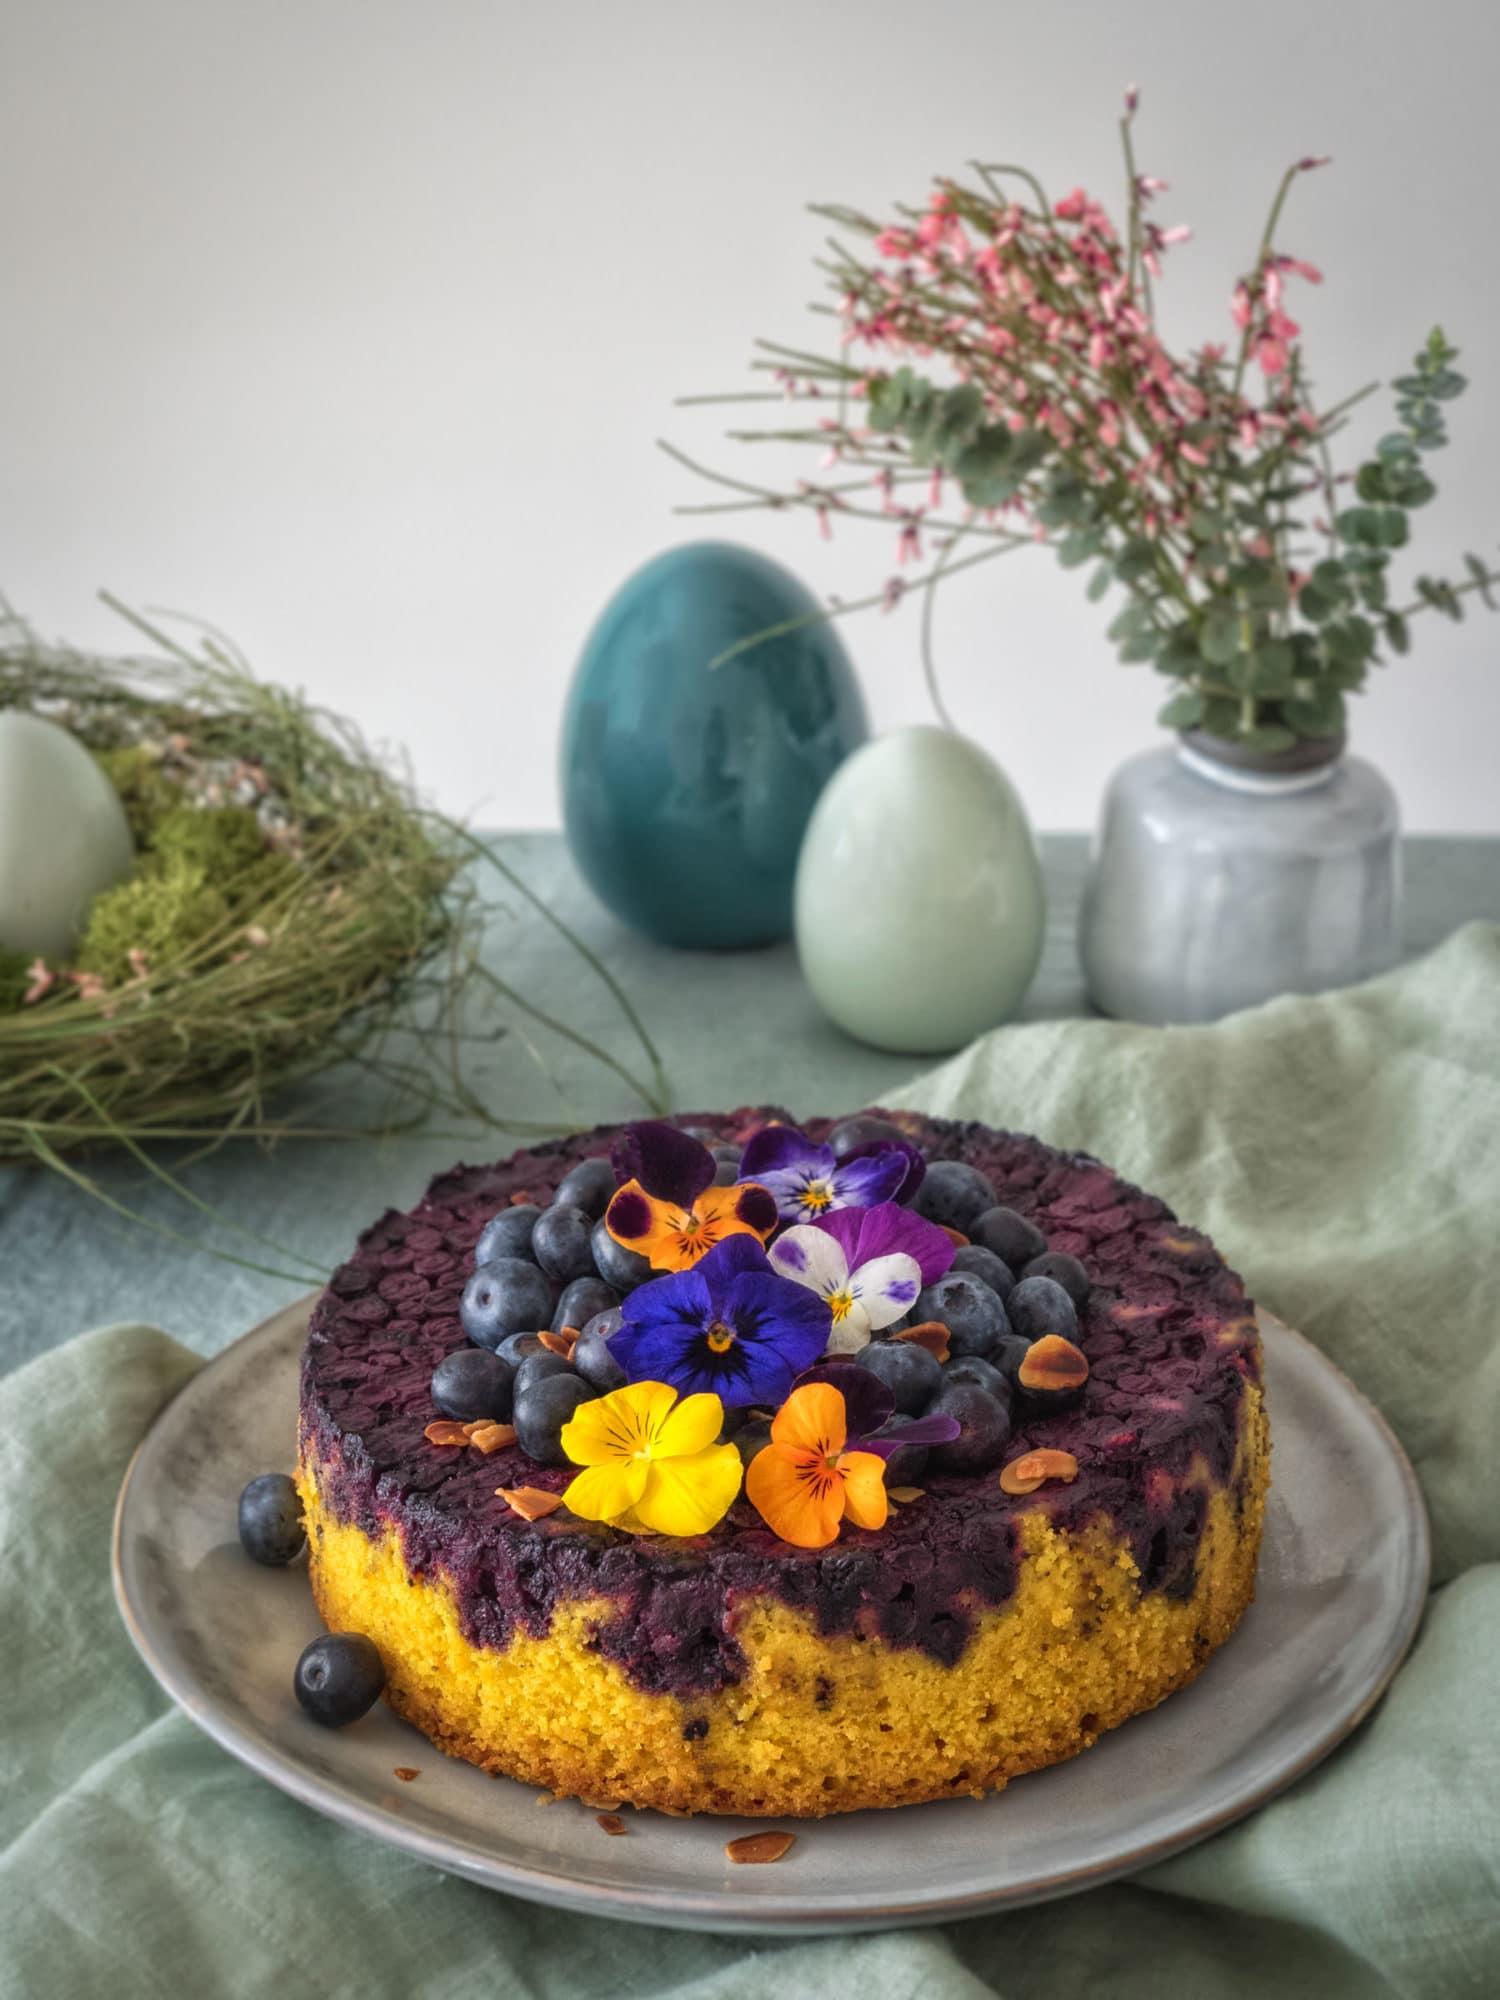 Kurkuma Kuchen mit Blaubeeren und Leonardo Osterdeko